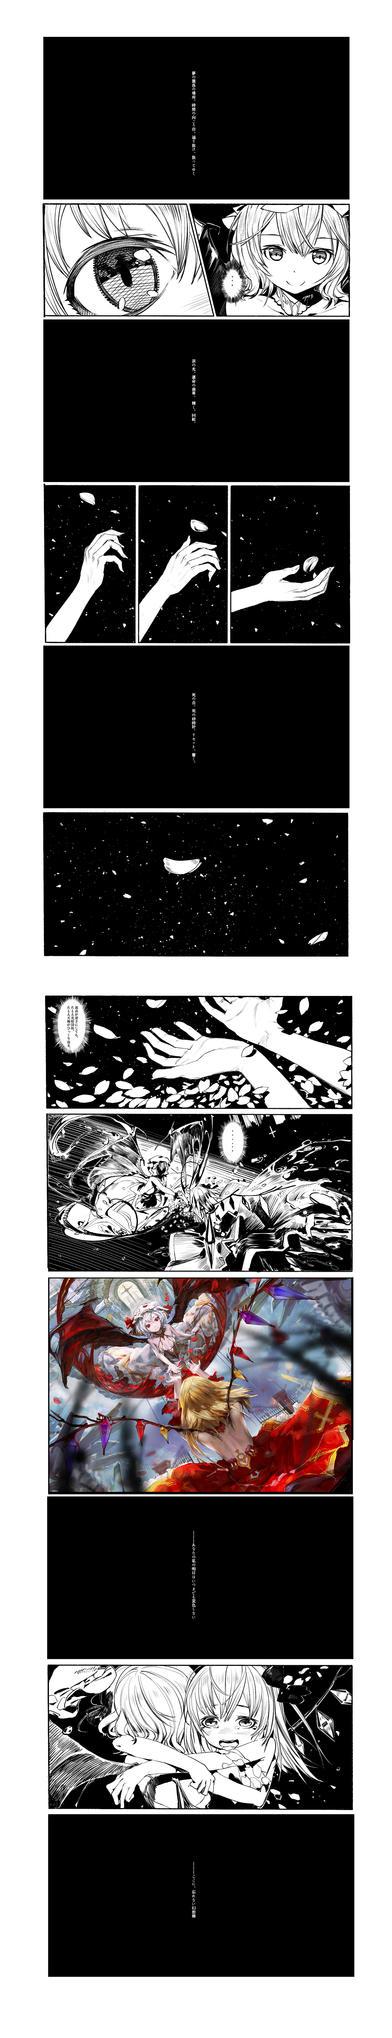 Broken Space by DanEvan-ArtWork